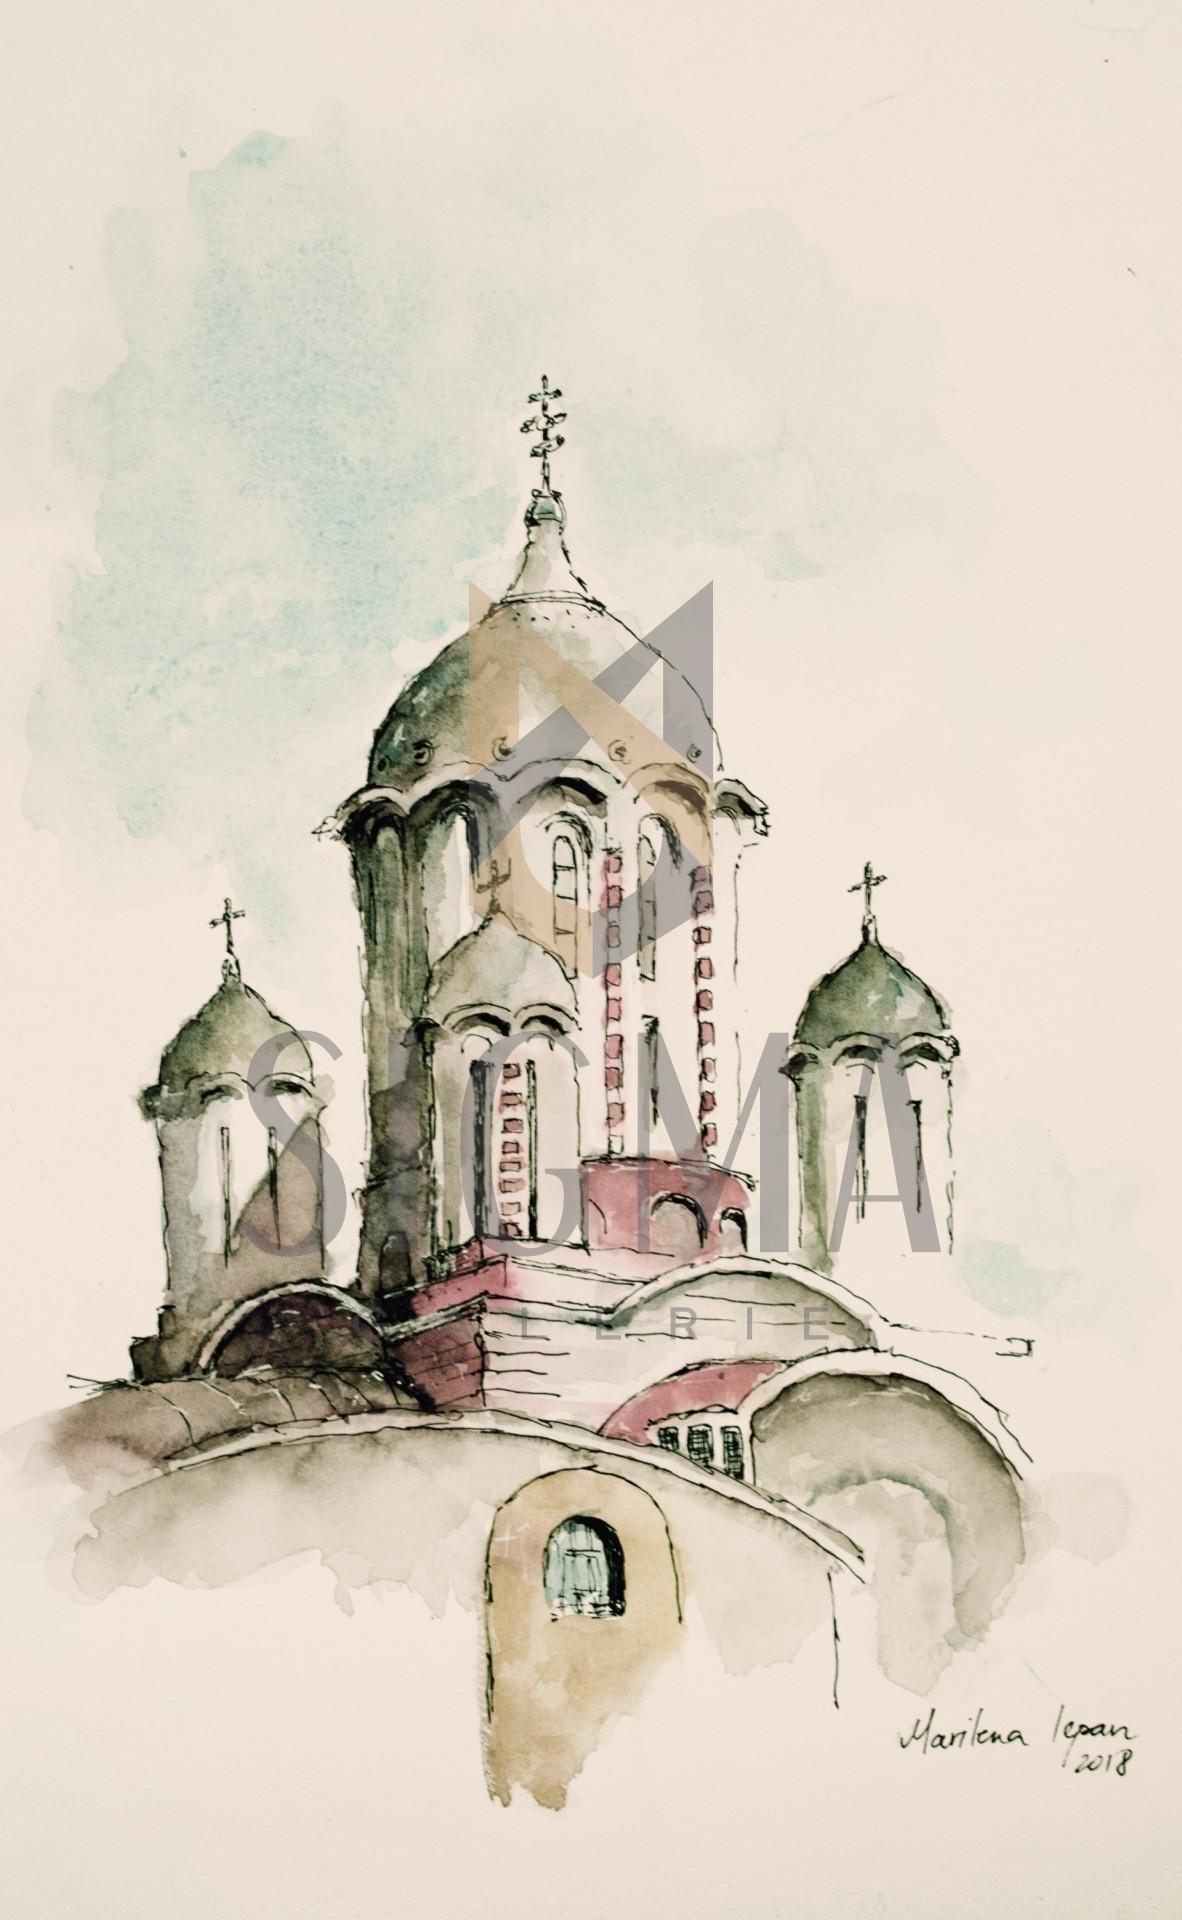 Tablou, Marilena Iepan, - Biserica Sf. Elefterie cel nou - acuarela si tus, 28x38 cm